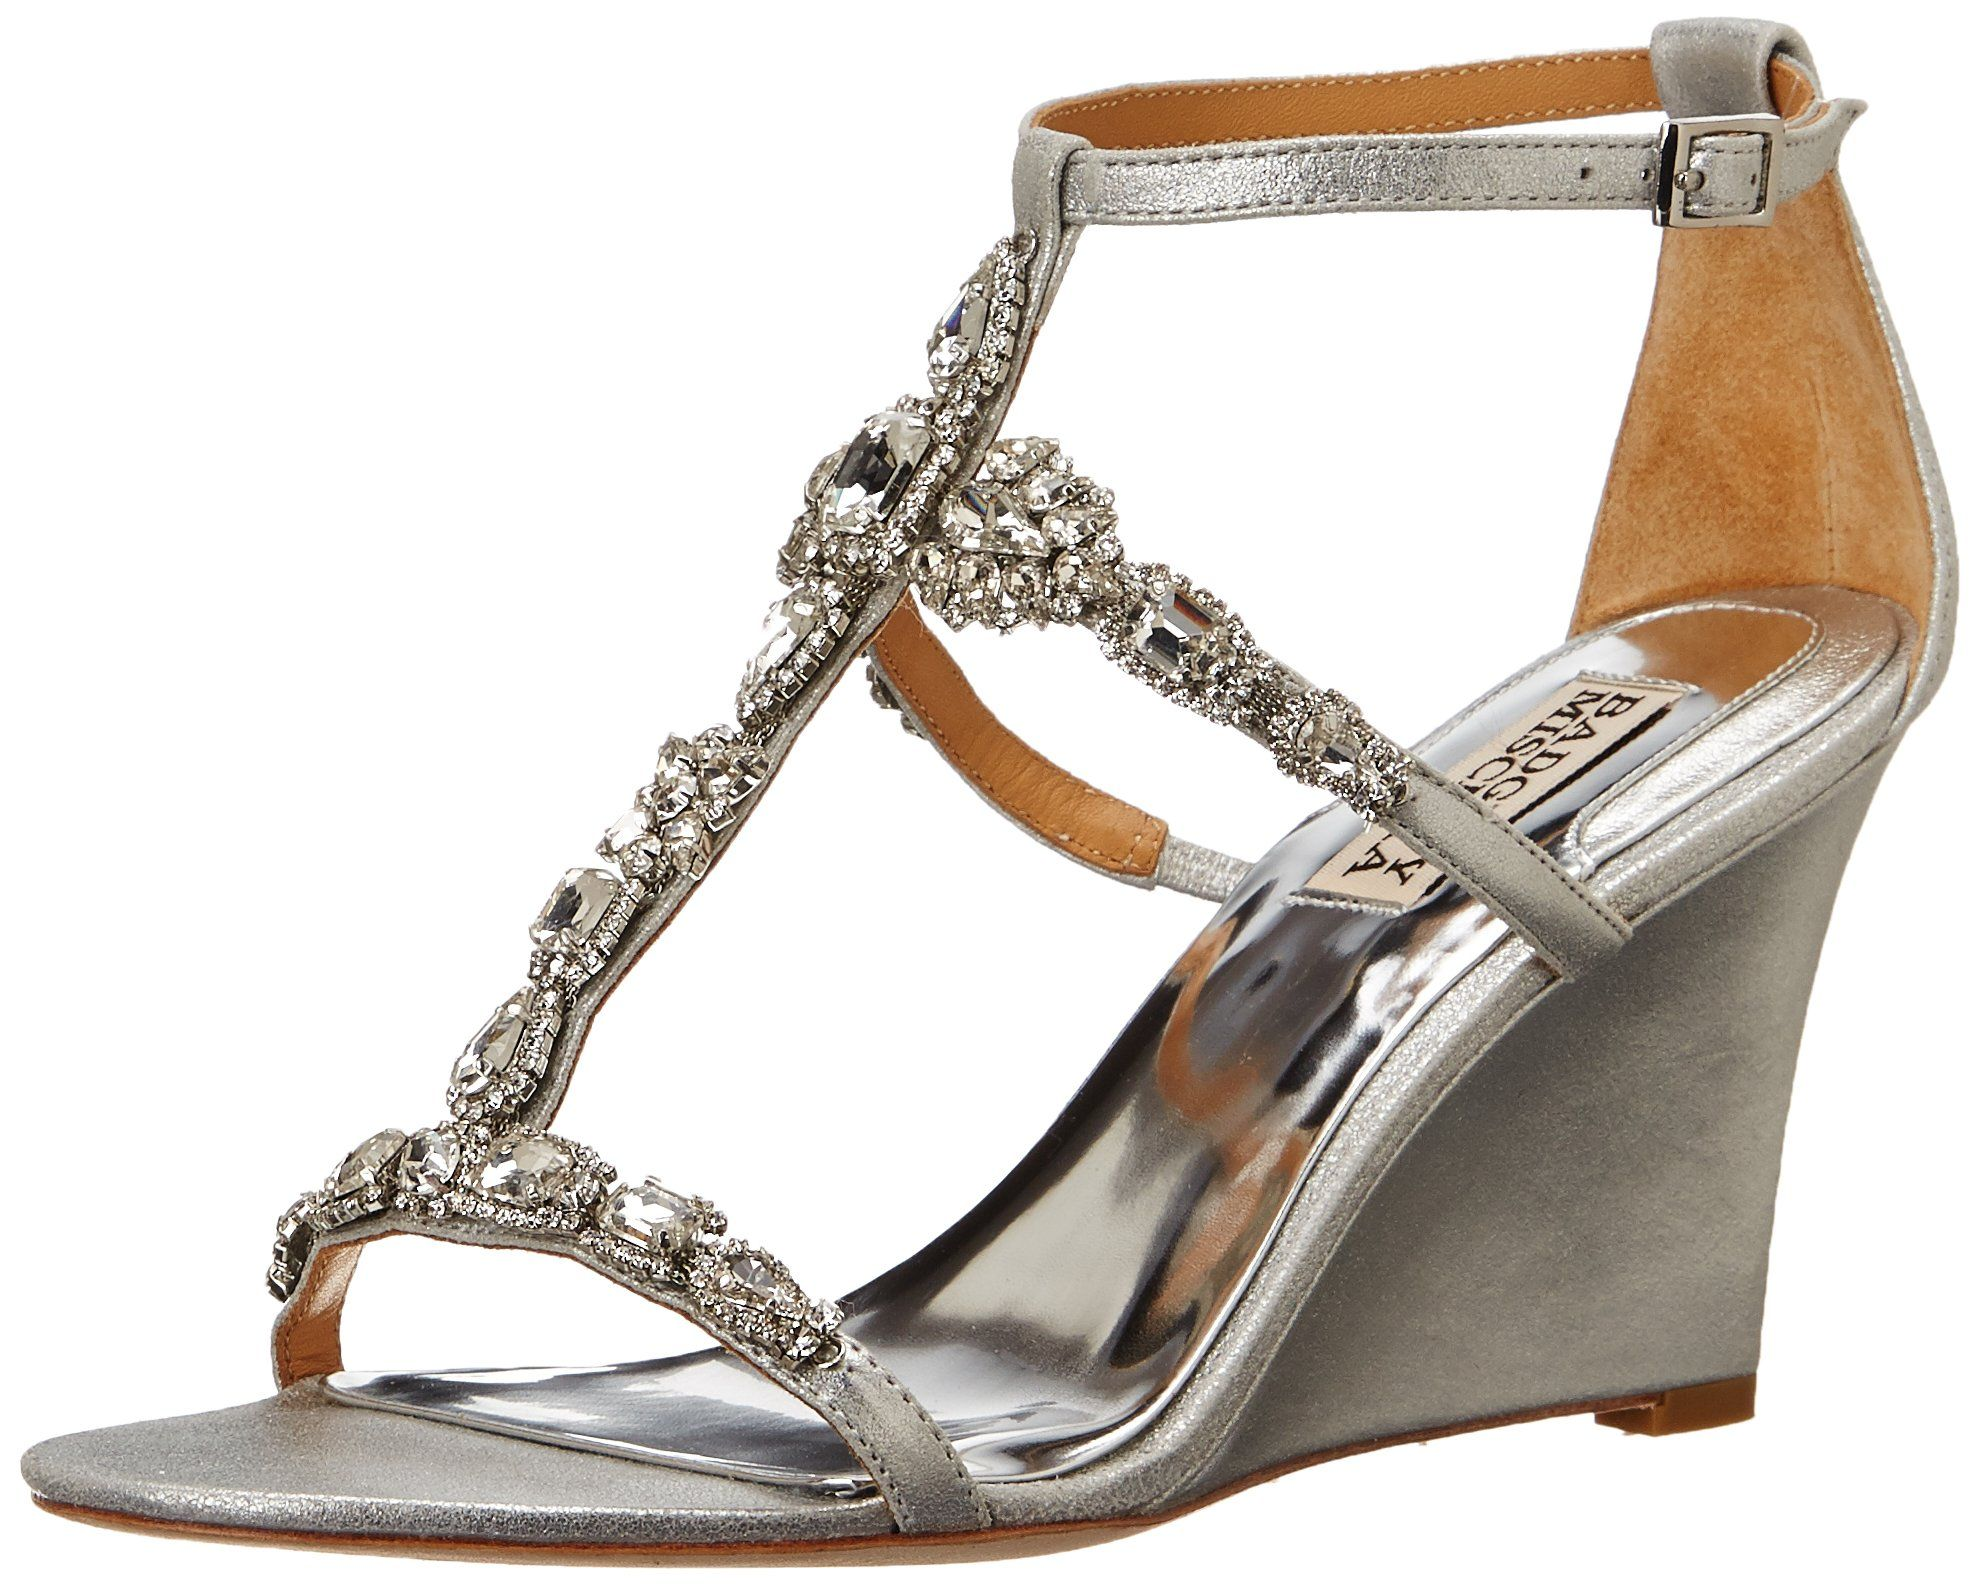 f796421d579 Amazon.com: Badgley Mischka Women's Melissa II Wedge Sandal: Shoes ...